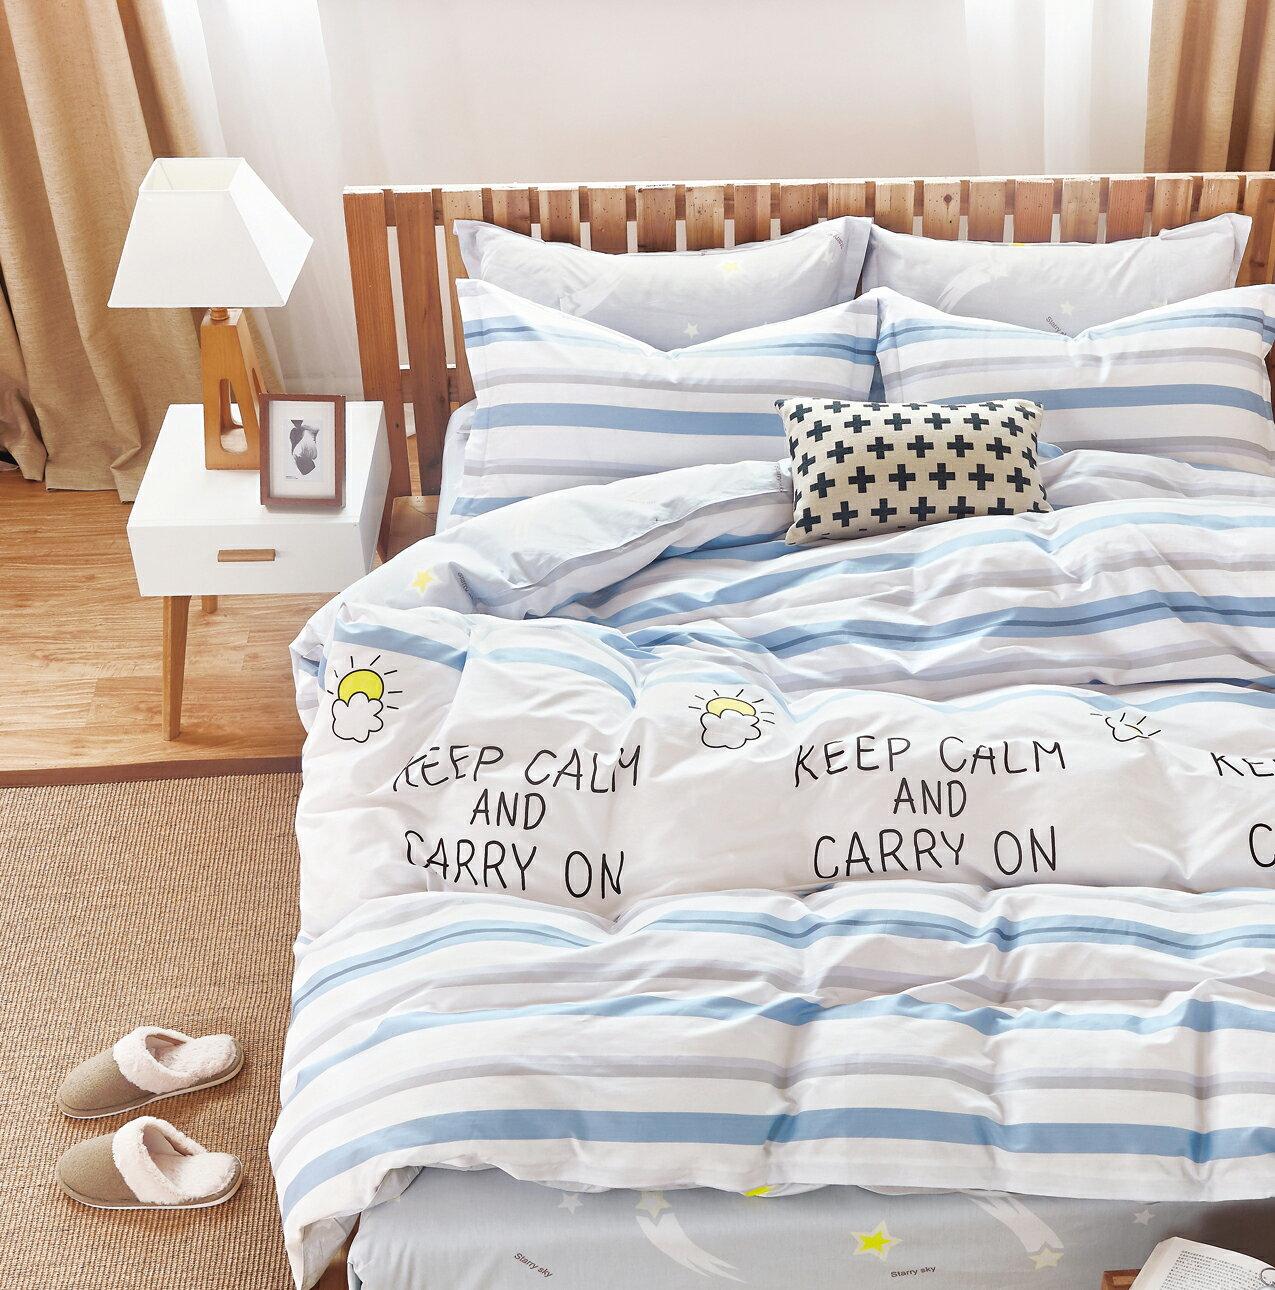 PureOne【白色戀人】雙人極致純棉四件式床包被套組